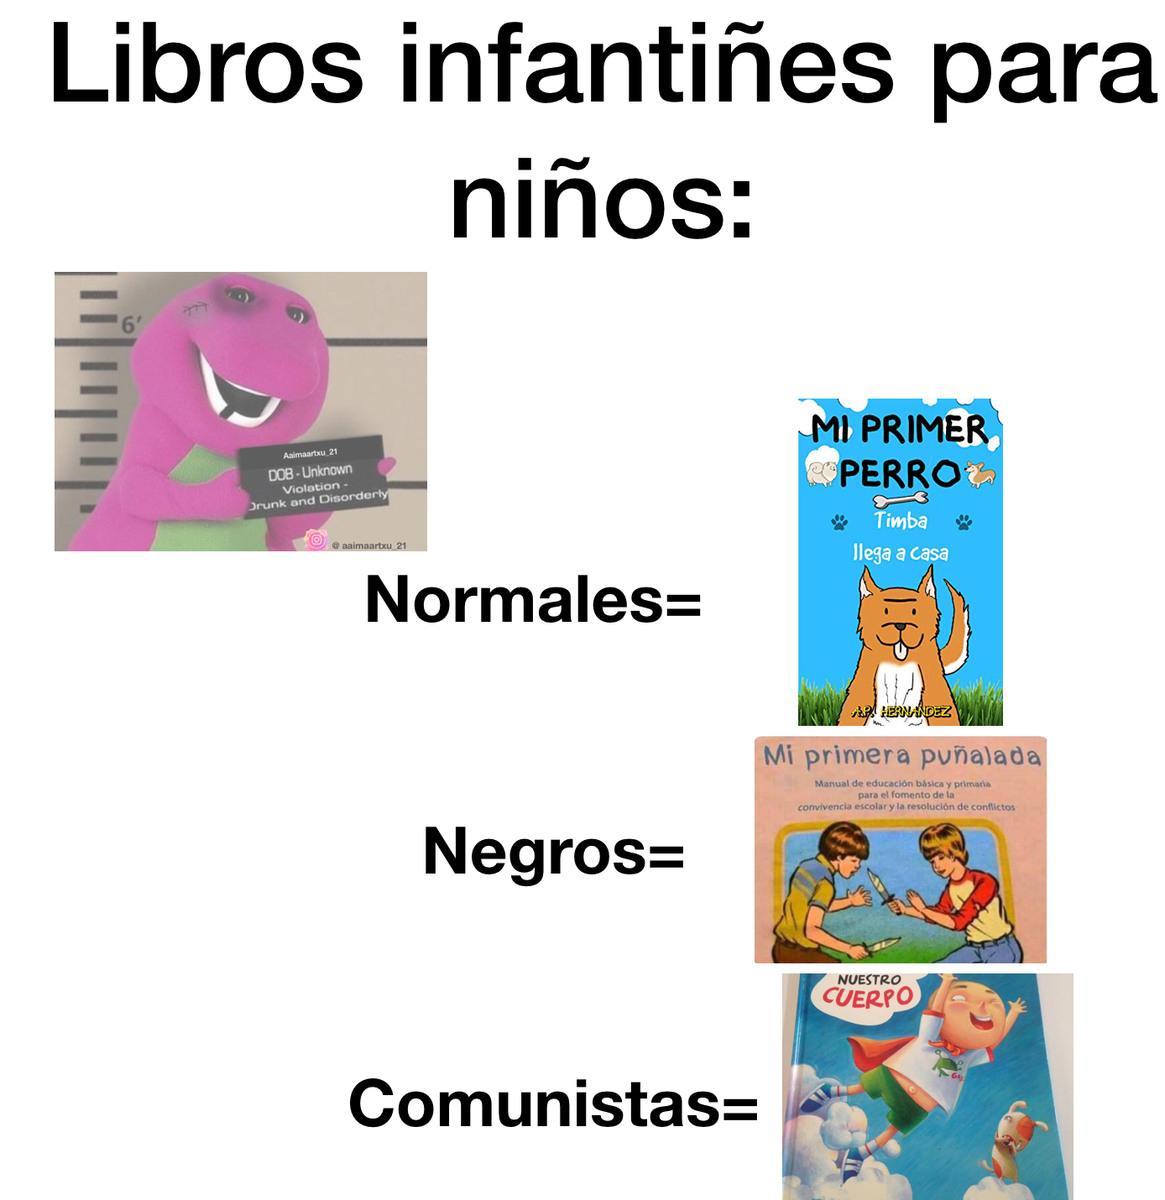 LibrosInfantiles - meme